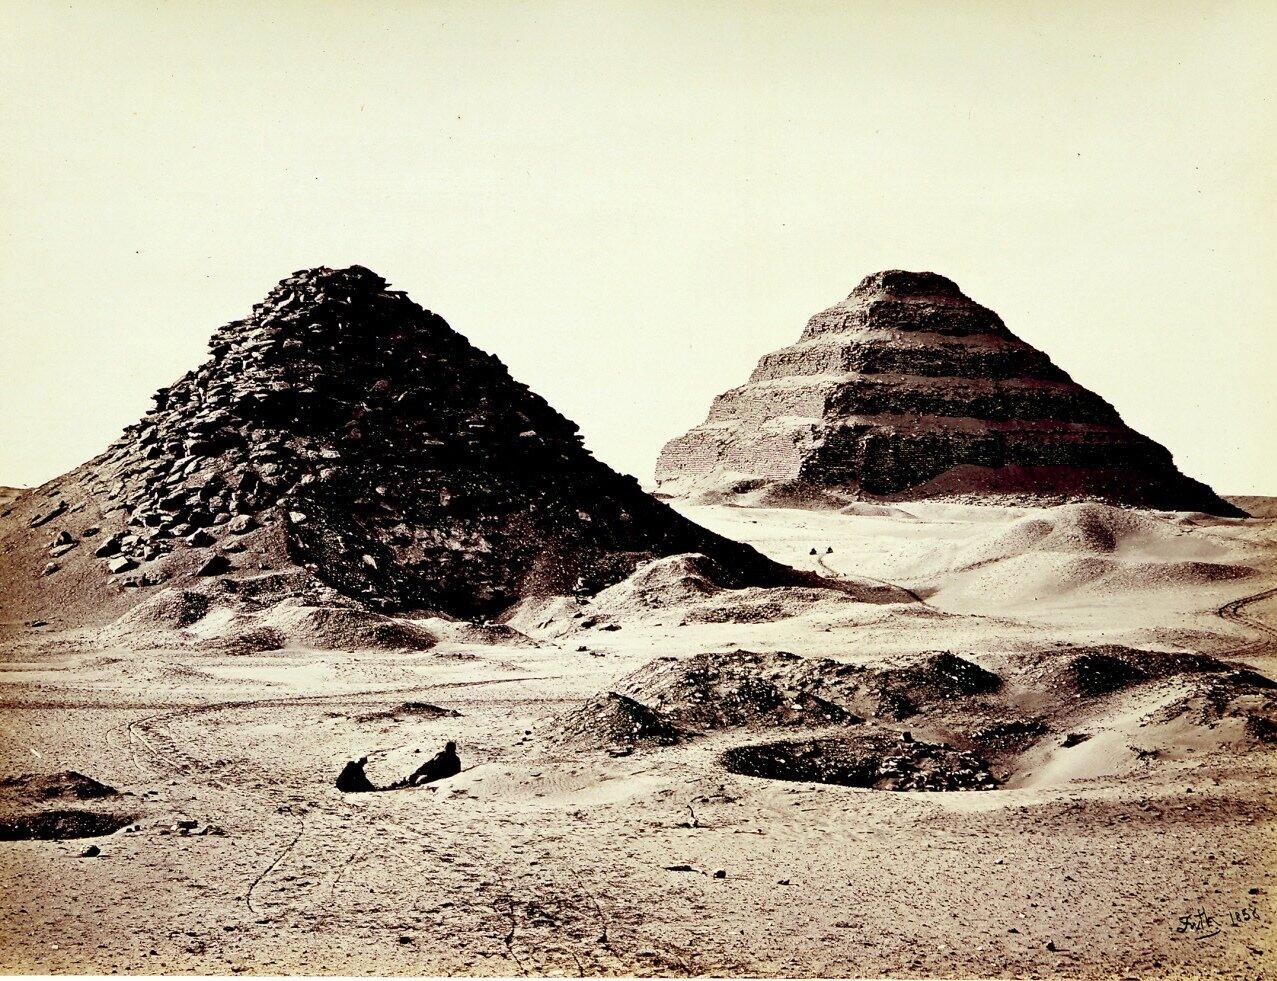 Саккара. Пирамиды, вид северо-востока. 1858